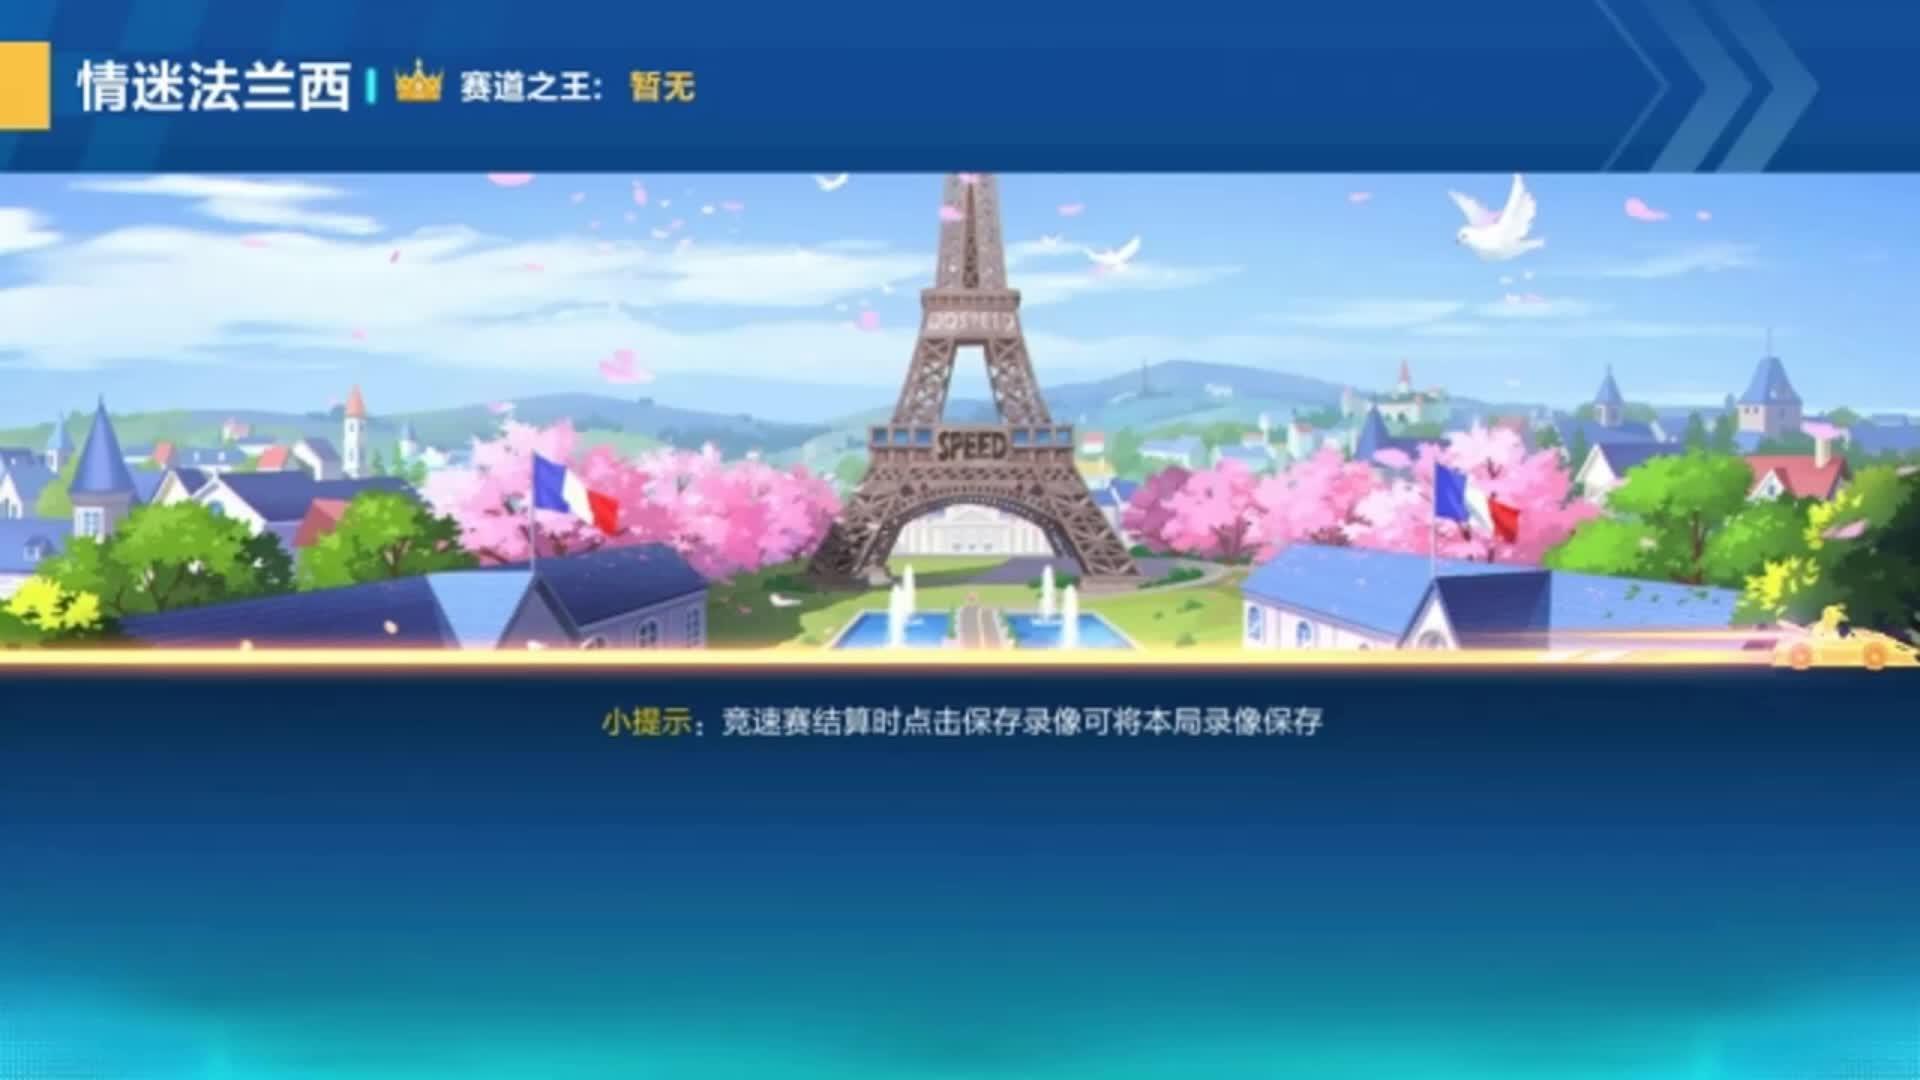 QQ飞车手游 情迷法兰西的赛道之王喷泉的近道能撞墙漂移